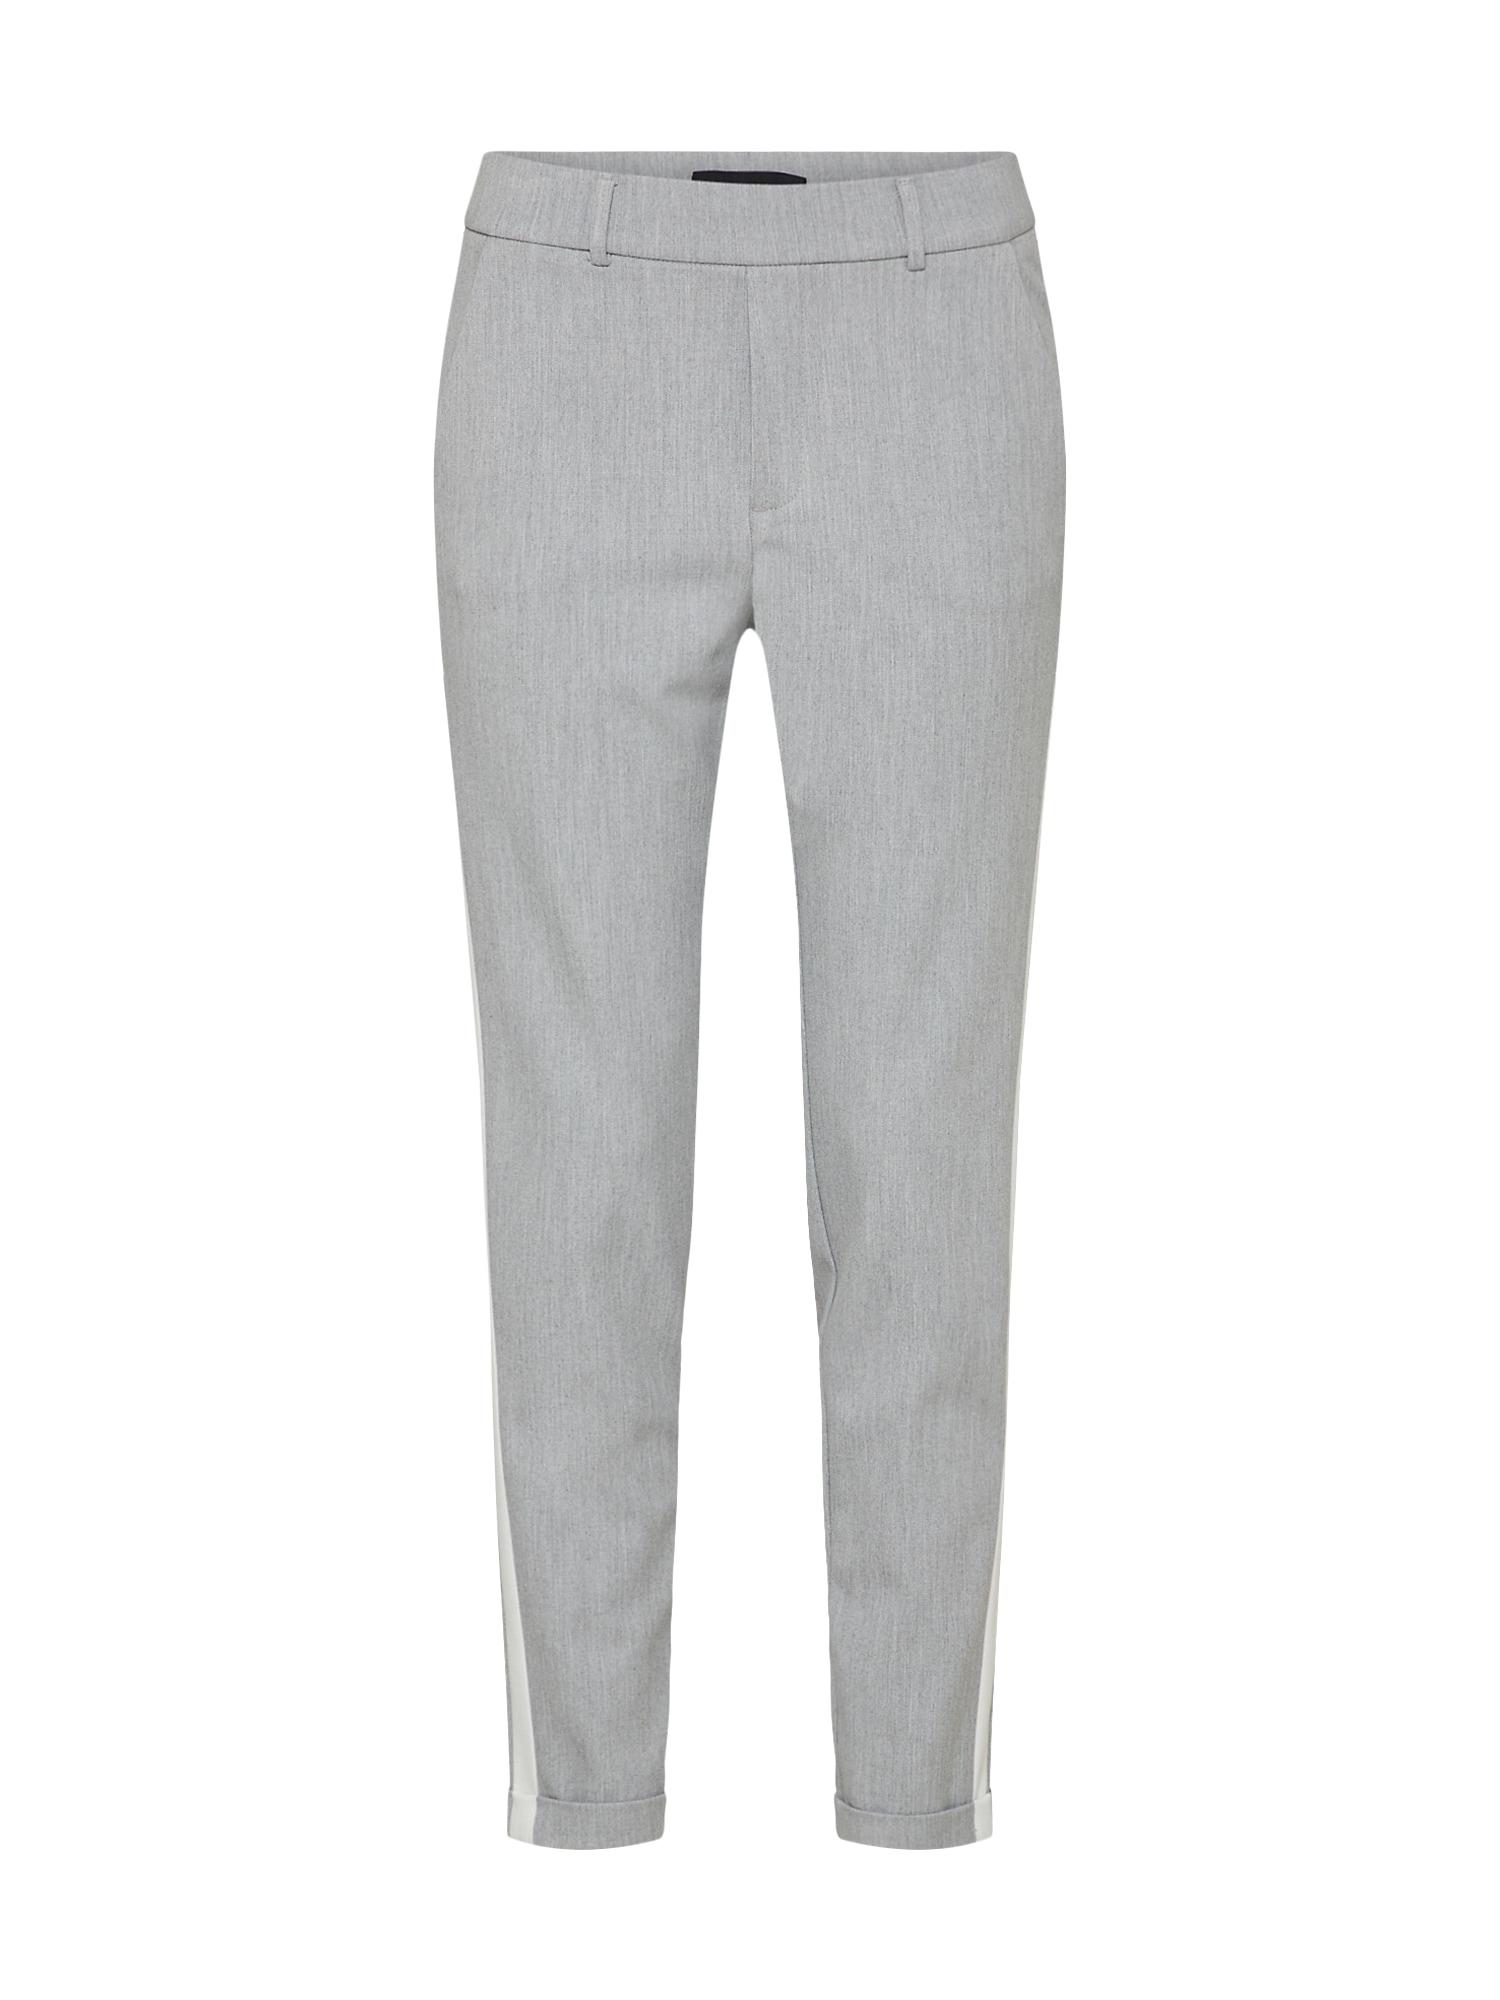 Kalhoty MAYA světle šedá bílá VERO MODA